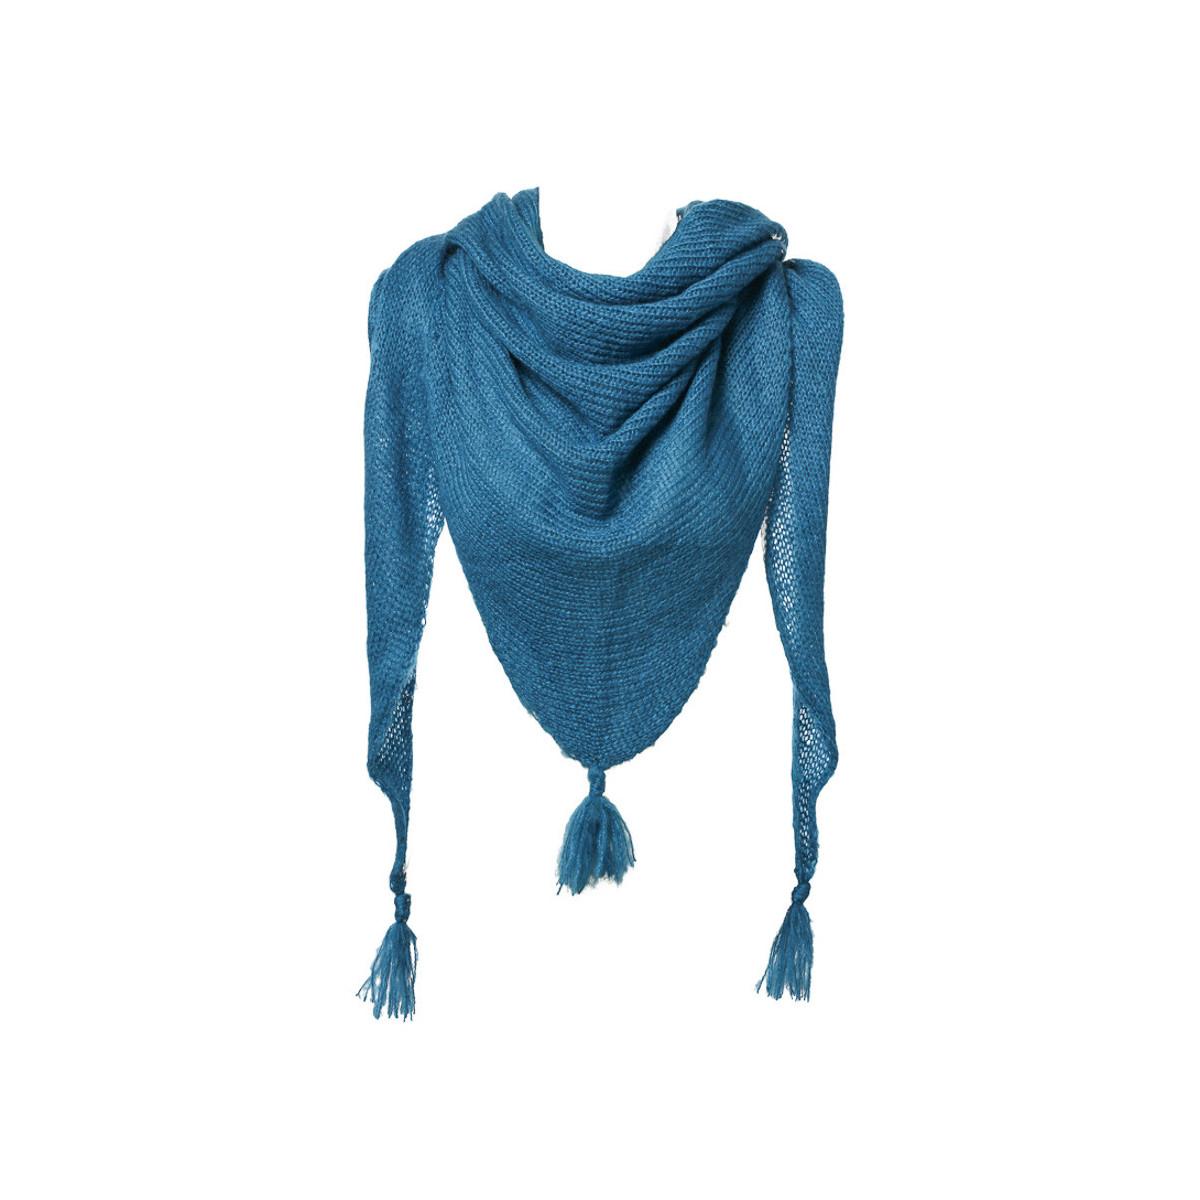 Etole écharpe triangle laine bleu Canard